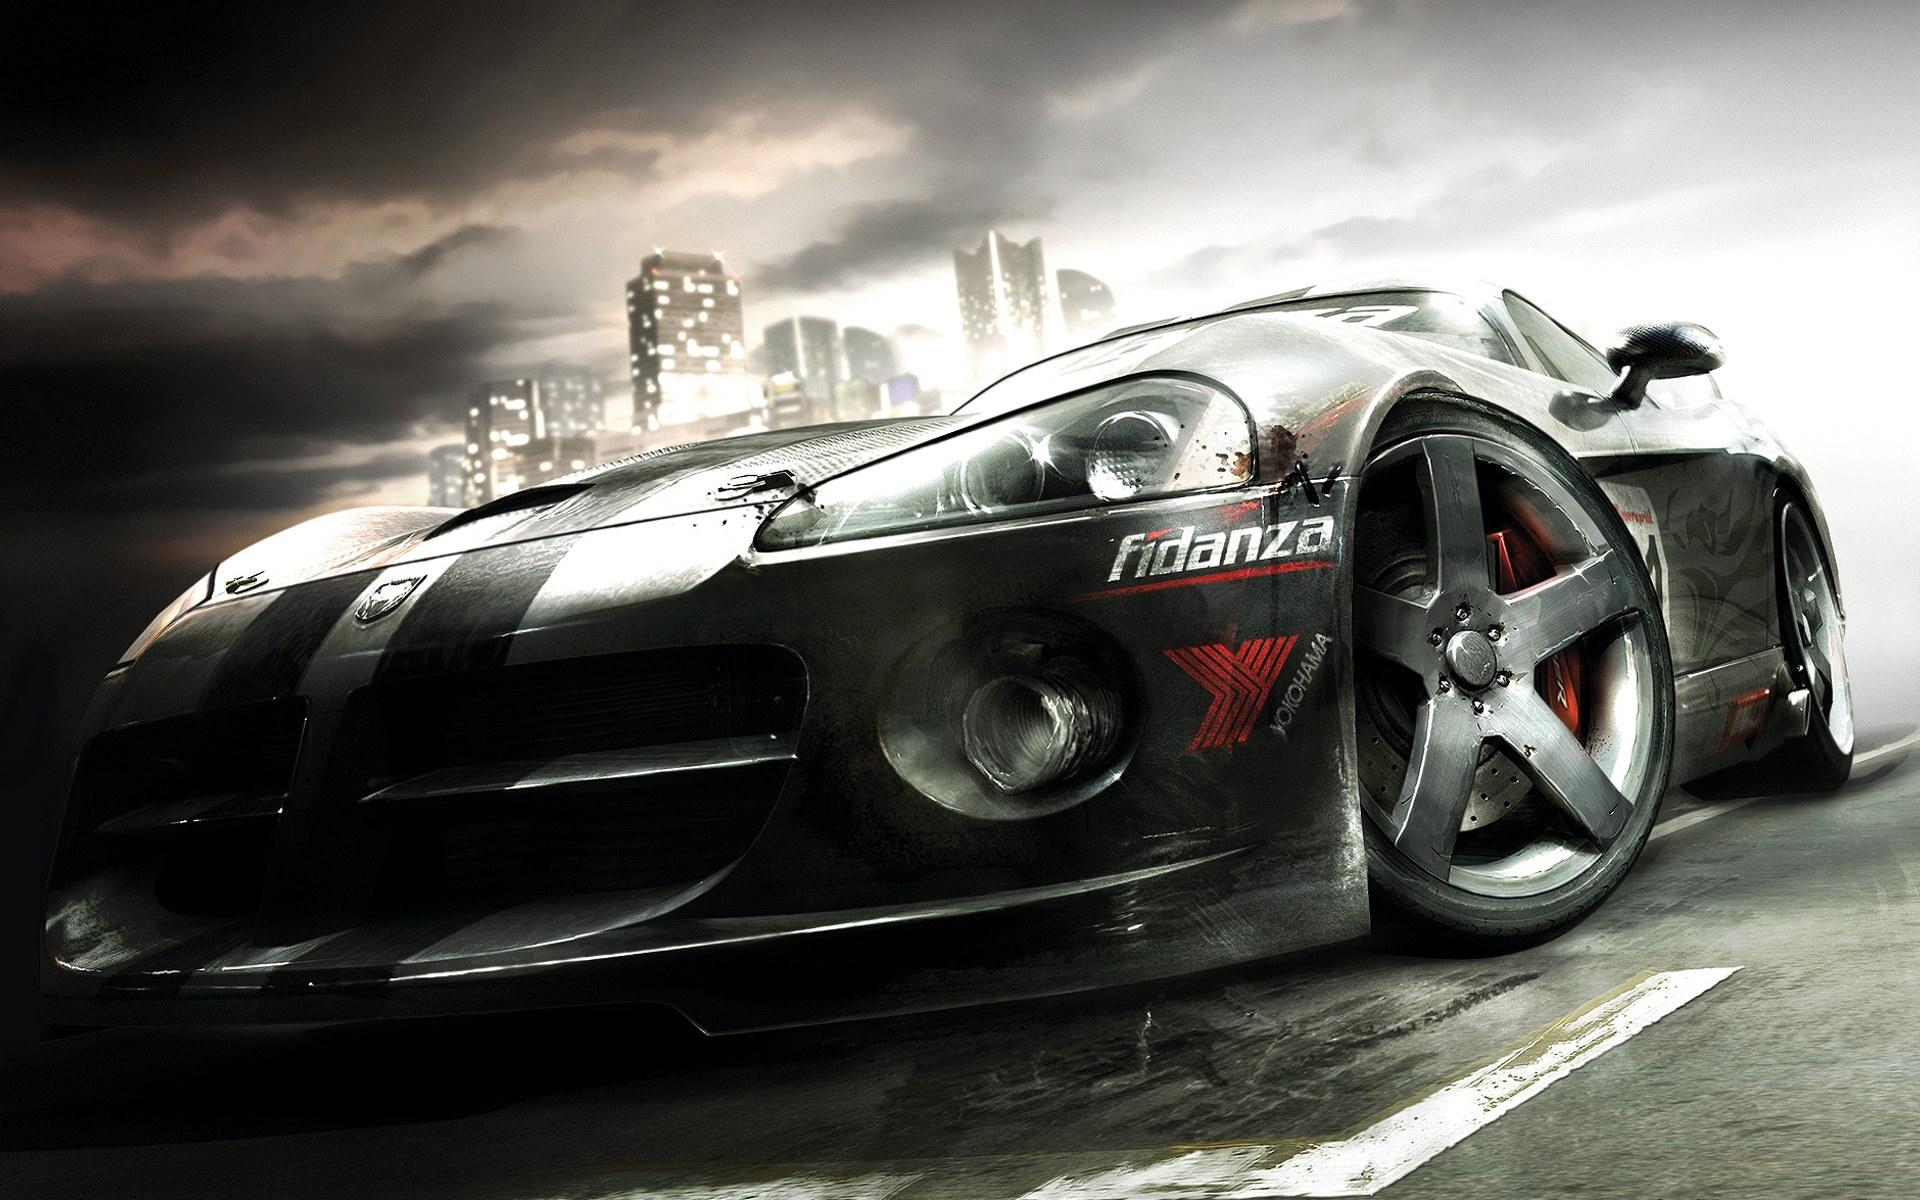 cool-race-car-wallpaper-wpc5803703